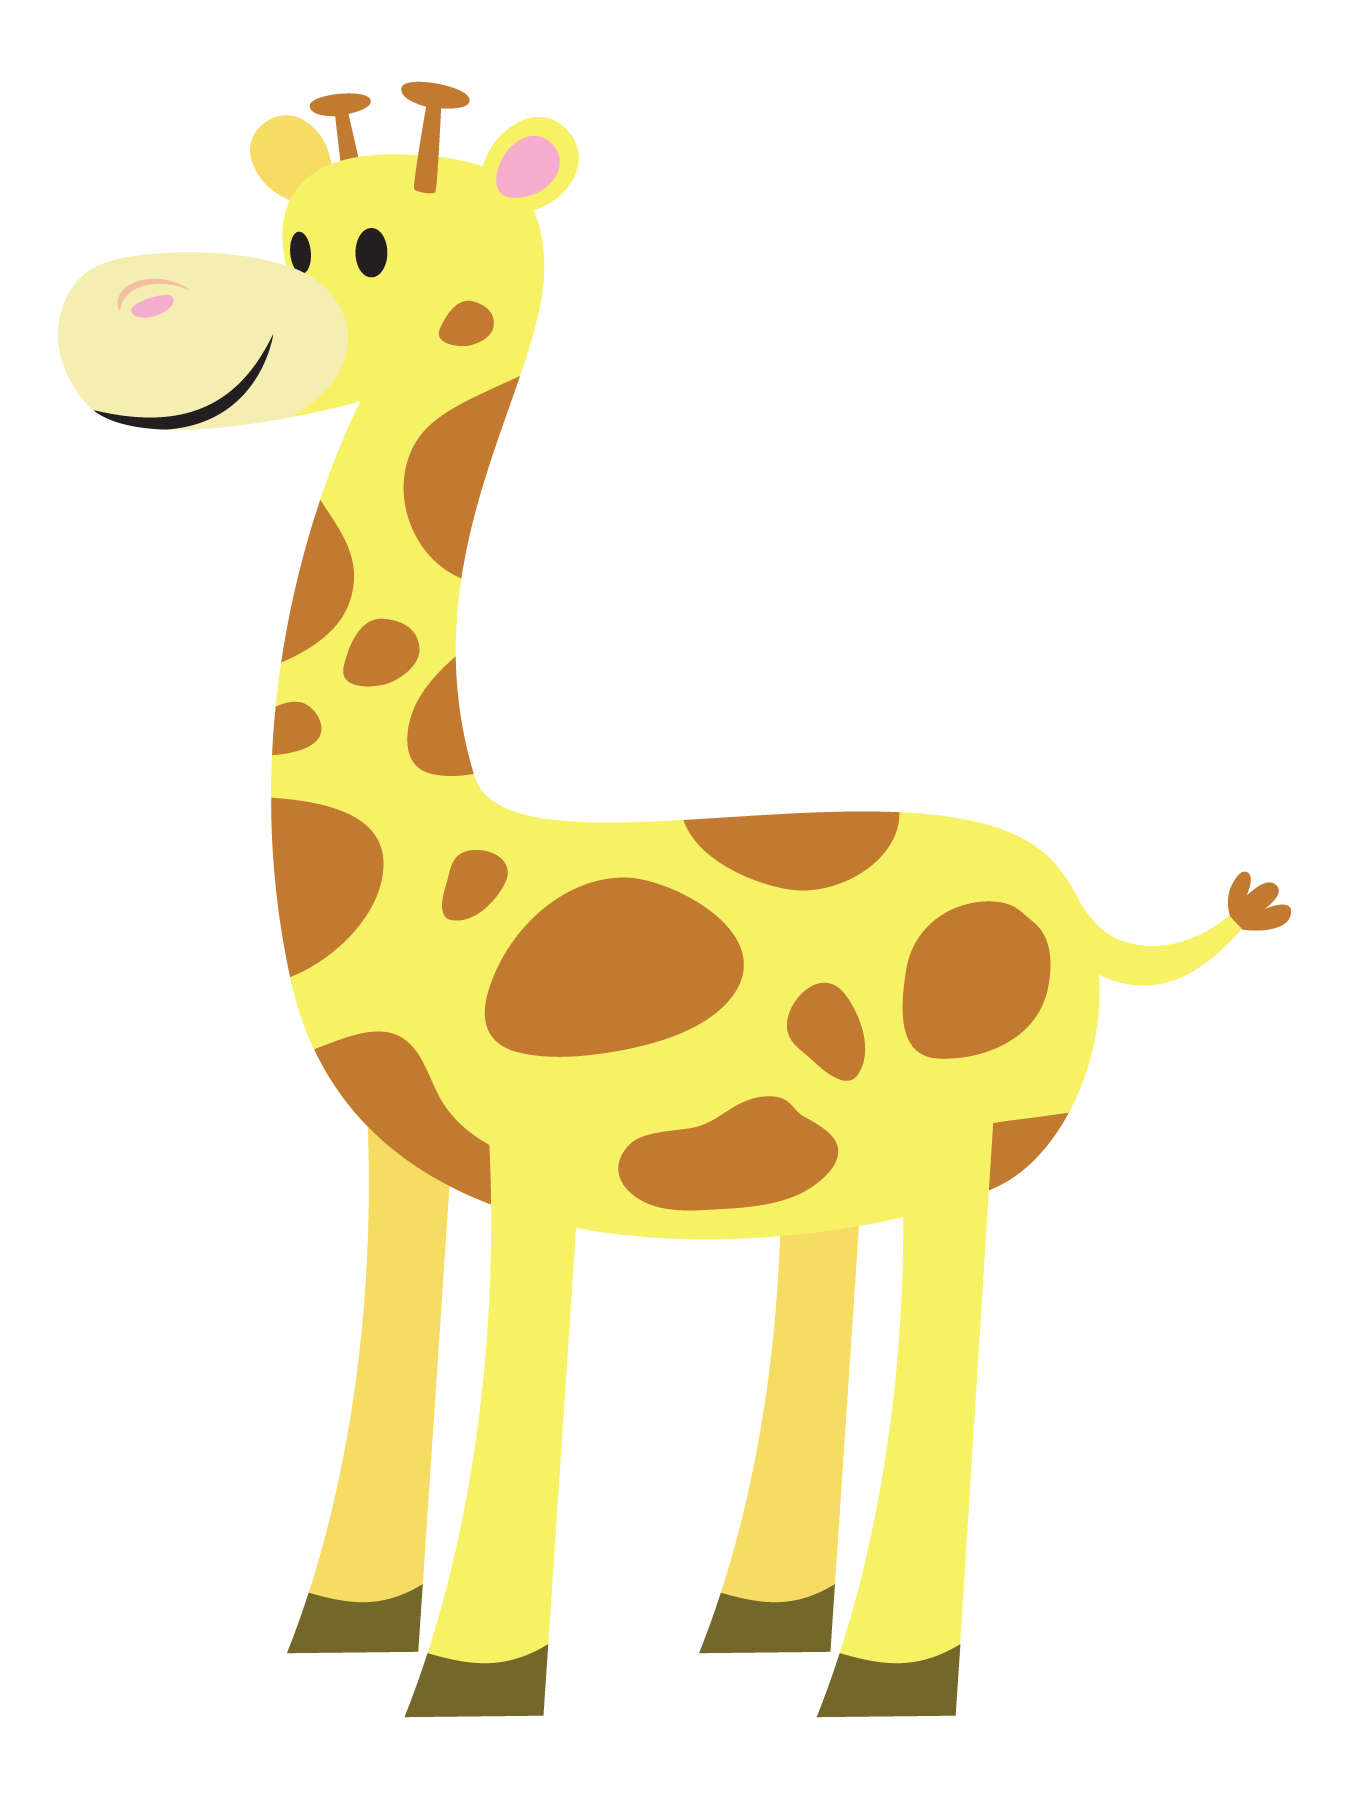 Baby Giraffe Clipart Clipart Panda Free -Baby Giraffe Clipart Clipart Panda Free Clipart Images-4